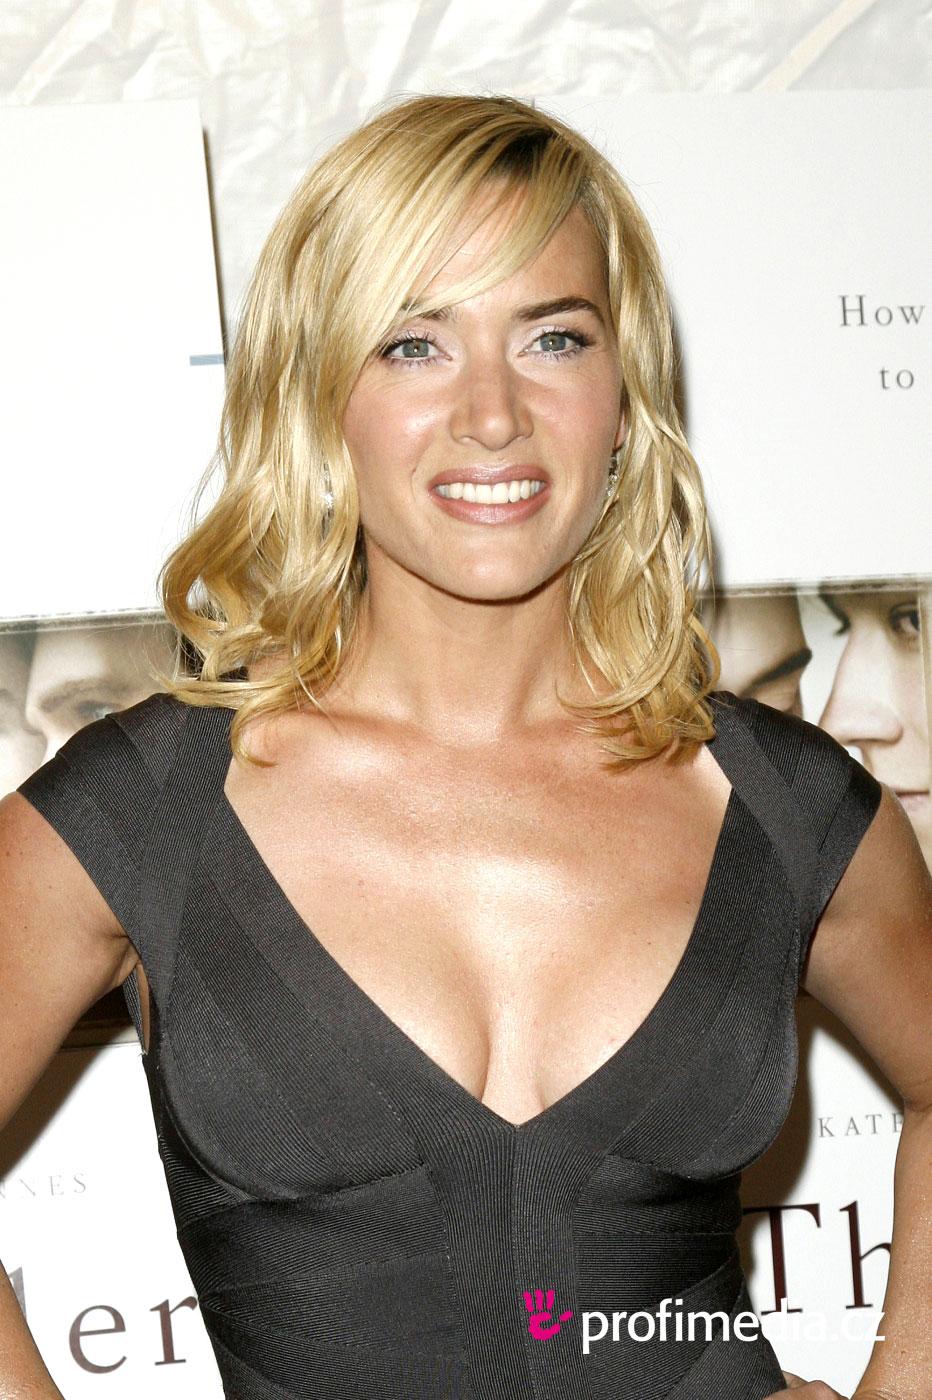 Kate Winslet Hairstyle Easyhairstyler